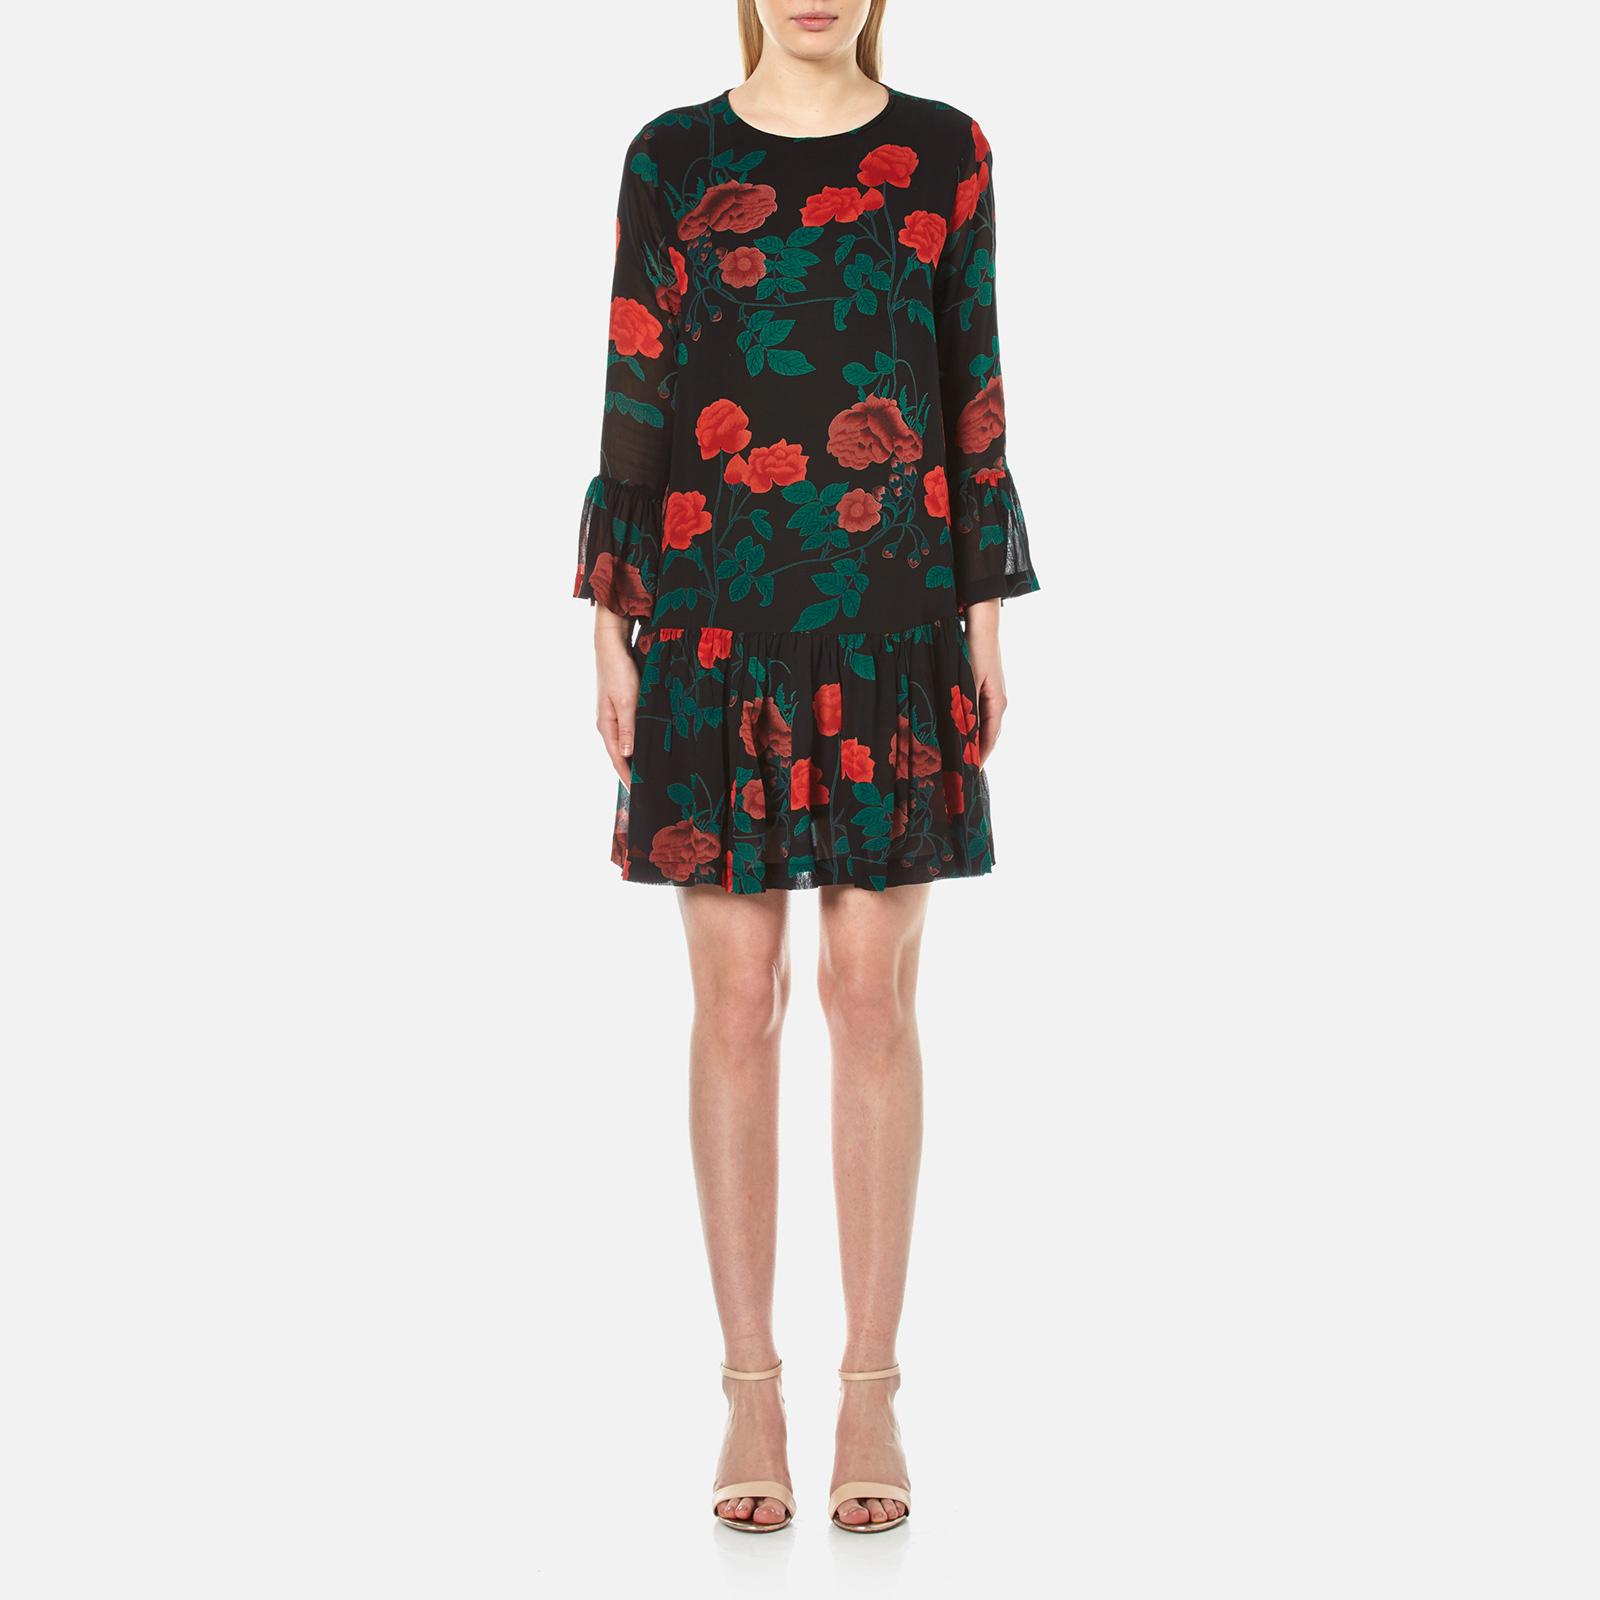 b2c83648 Ganni Women's Newman Georgette Short Dress - Black - Free UK Delivery over  £50